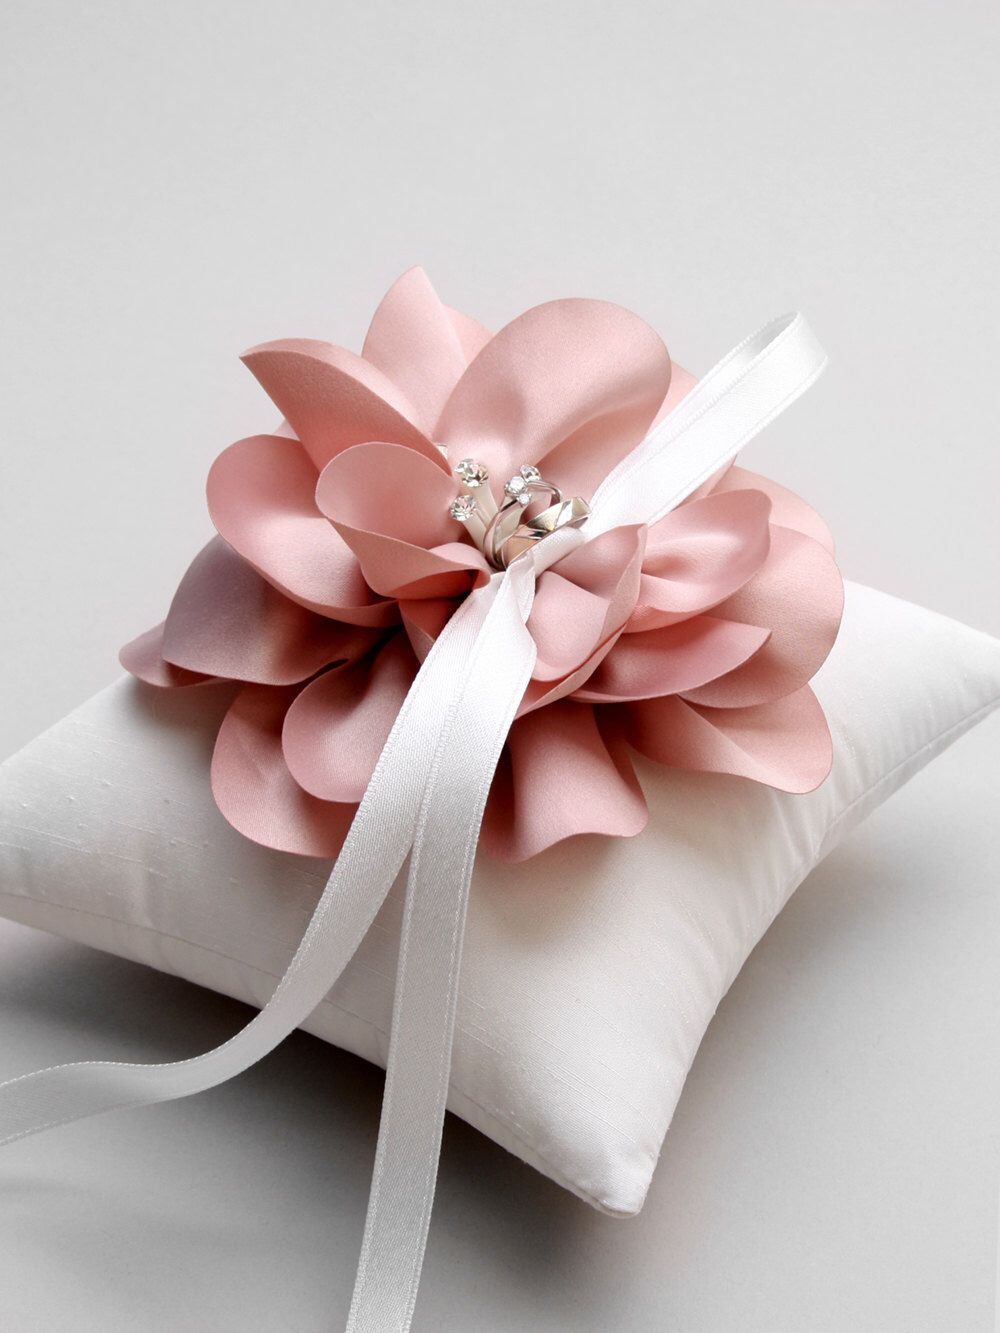 img ring dress cake fat big tim wedding to pillow and patty s blog